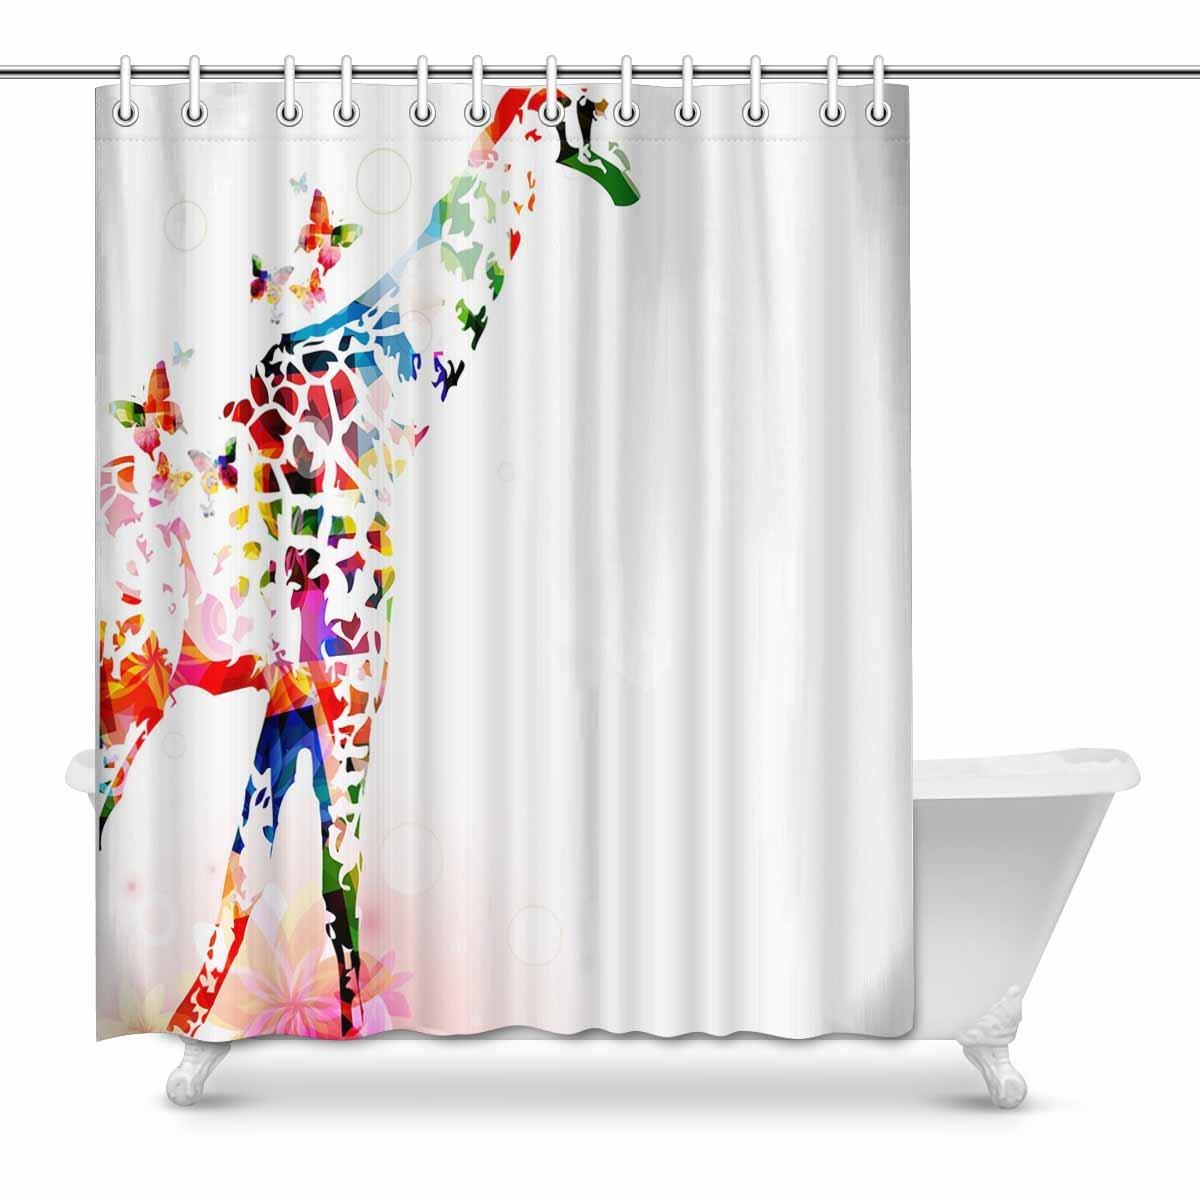 interestprint Giraffe at Lakeファブリック浴室シャワーカーテンフック付きインテリアセット 60 W x inches 72 全品最安値に挑戦 72l マルチ4 X 希少 B07BFRMRJH